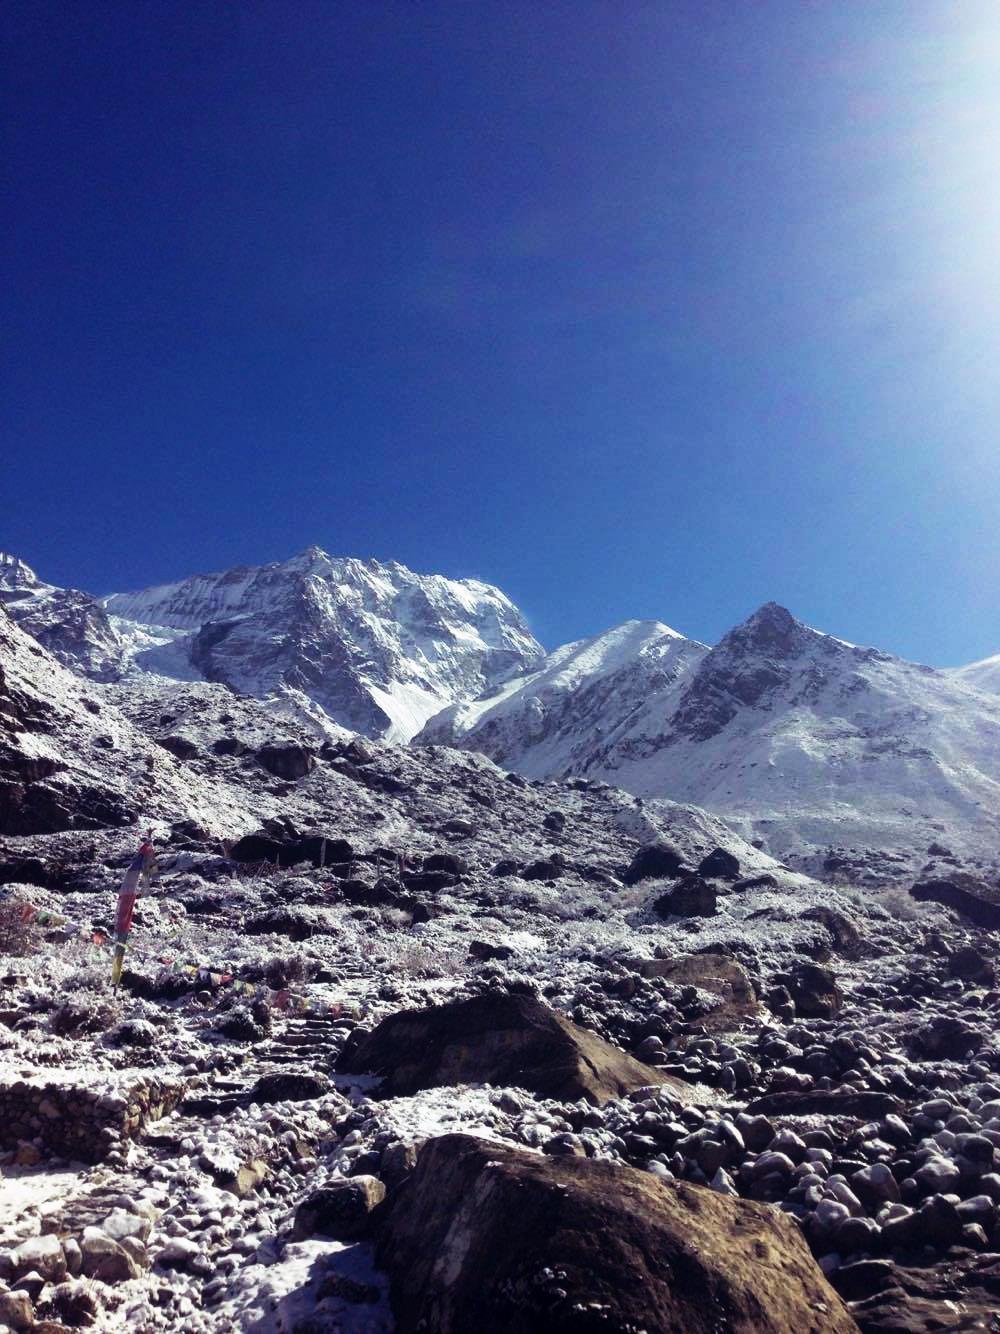 Langtang_snowy_mountains_and-sun2_April_2016_Adventure_Alternative_Nepal.jpg